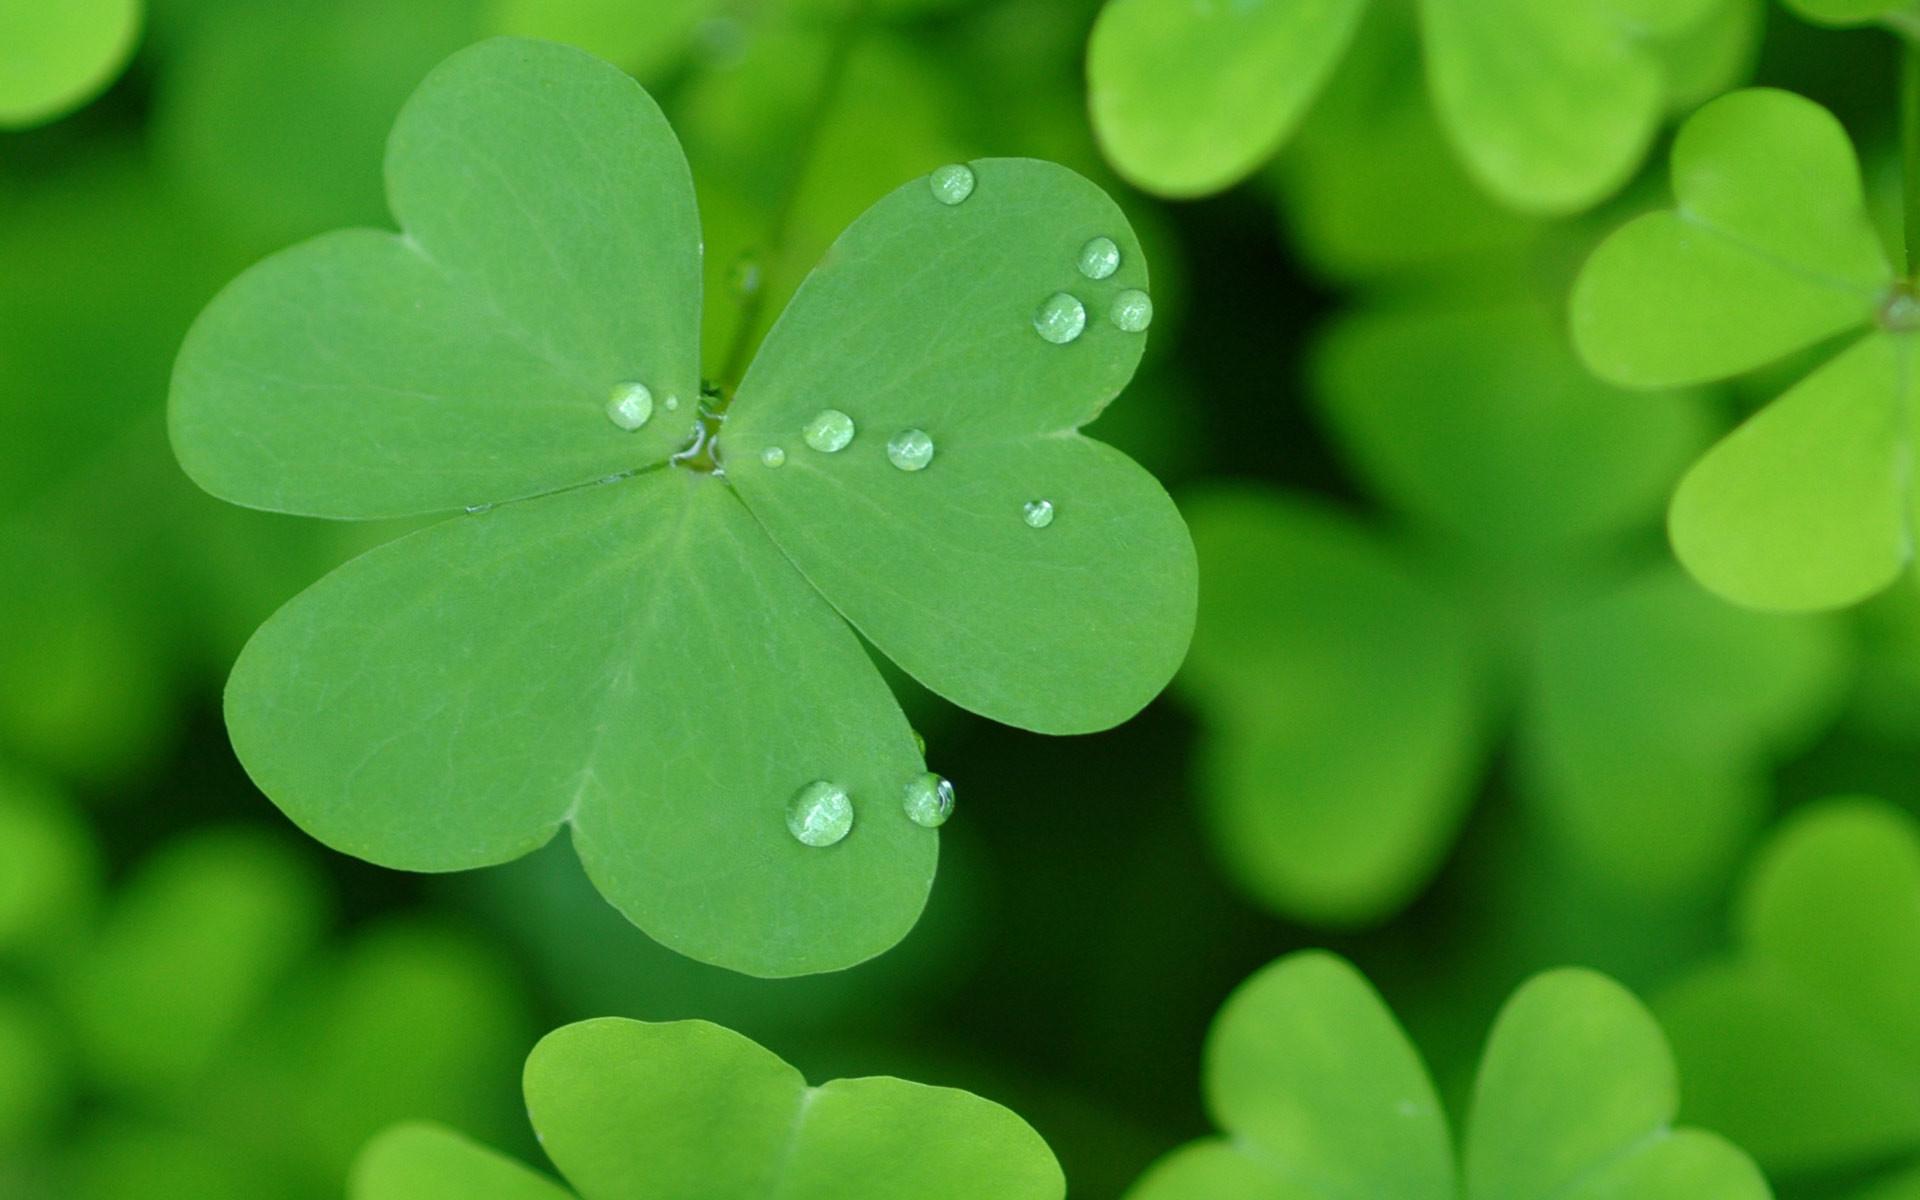 Image St Patricks Day